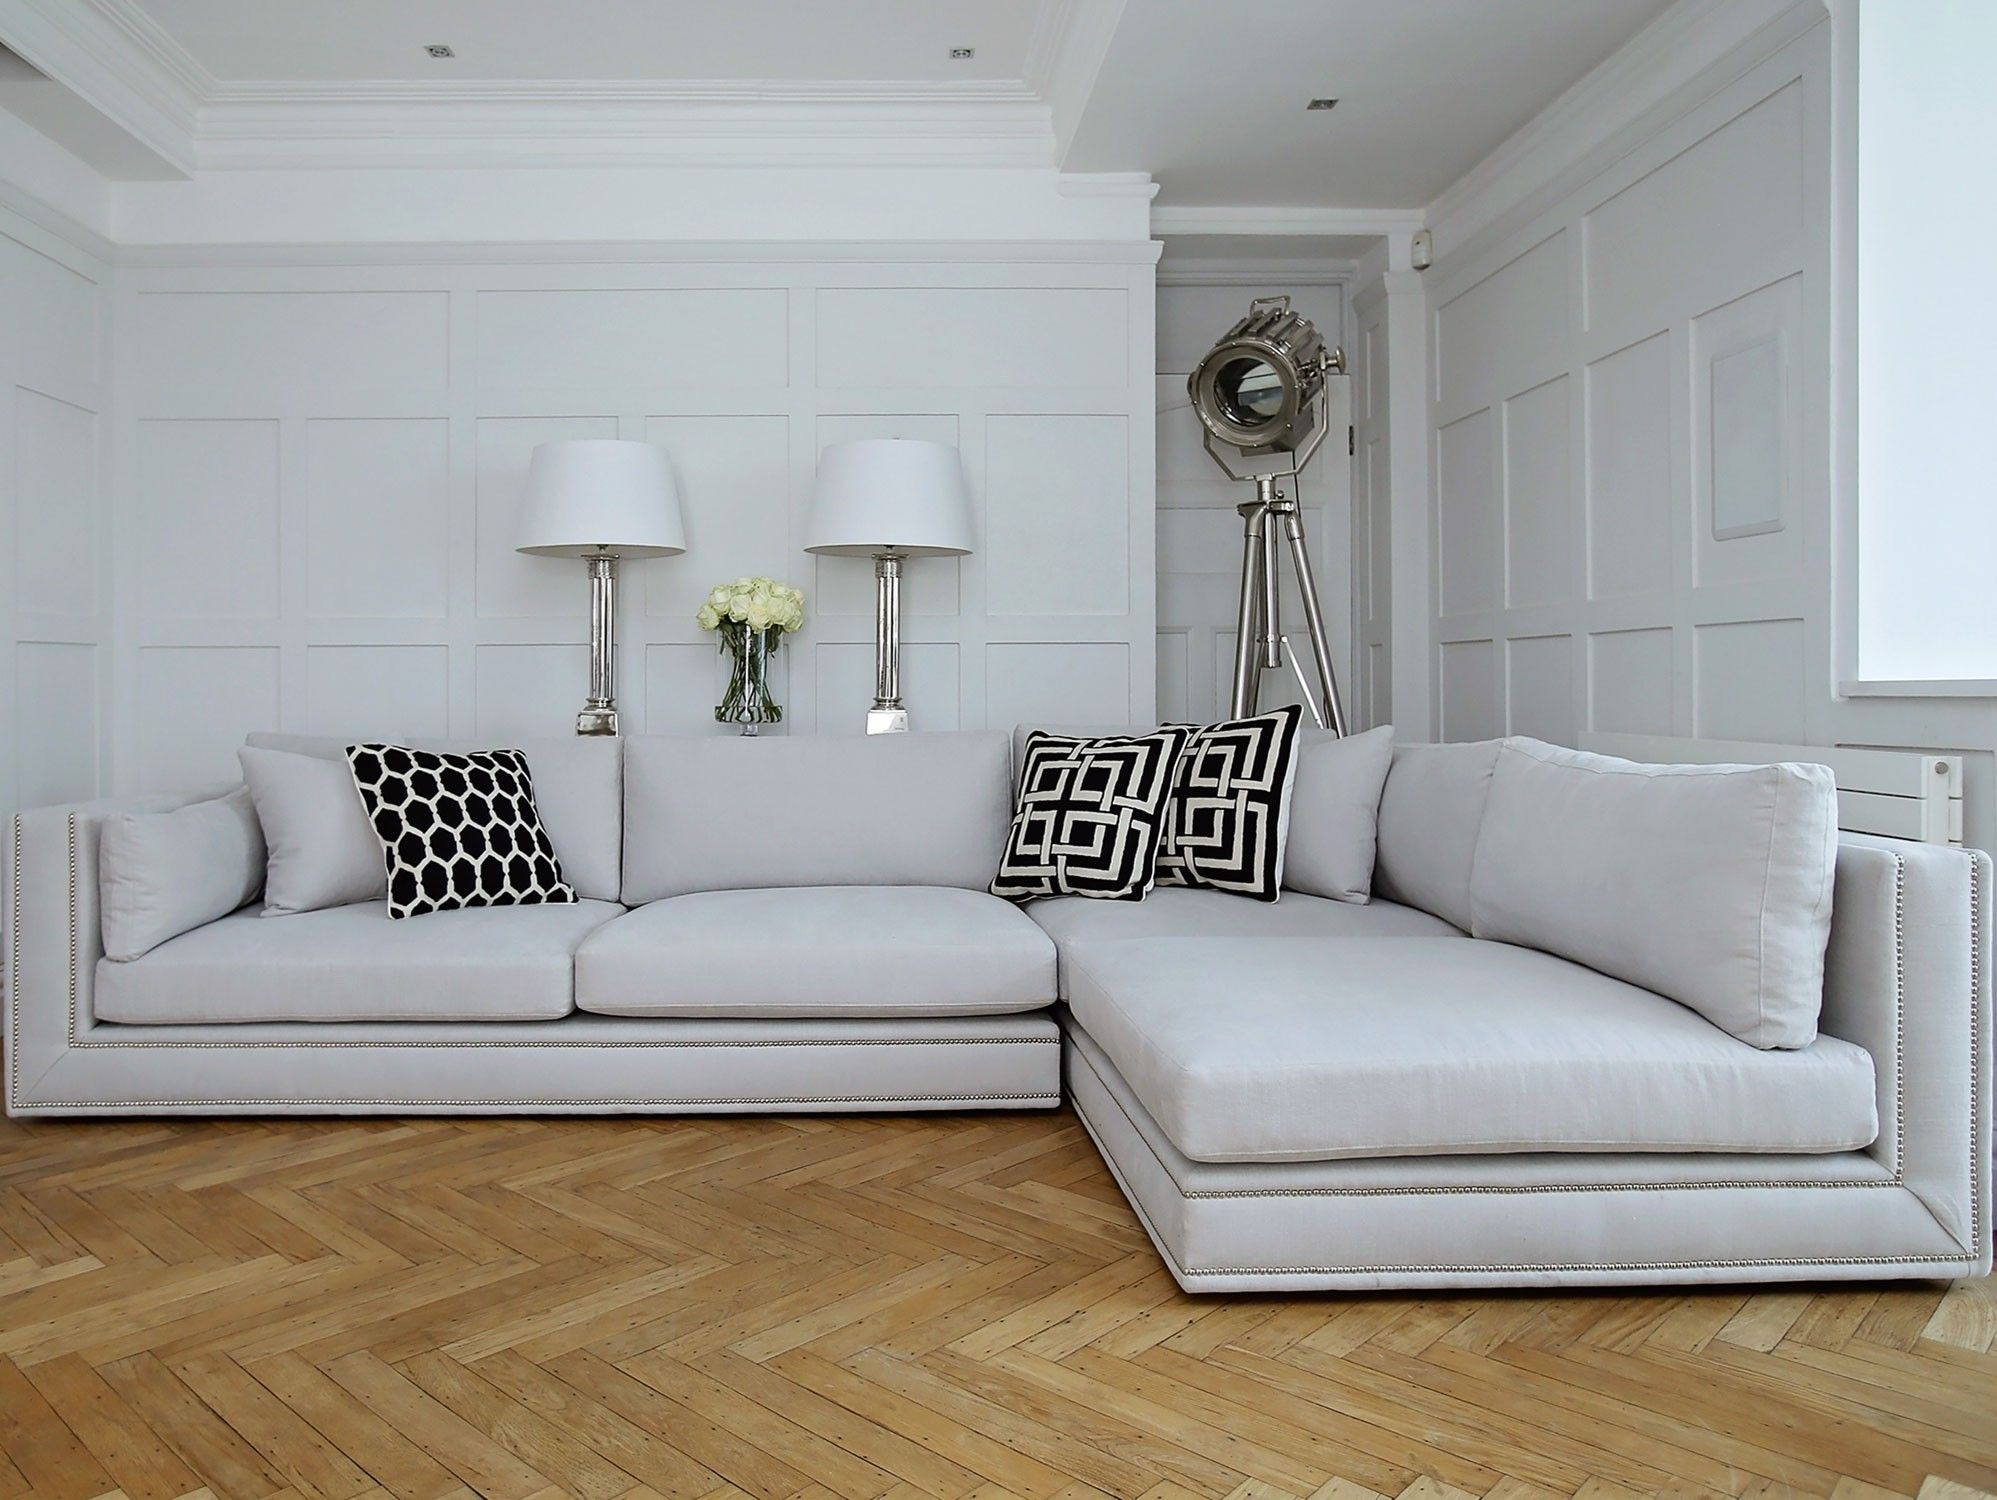 http://www.sweetpeaandwillow.com/sofas-seating/sofas/bancroft-sofa ...